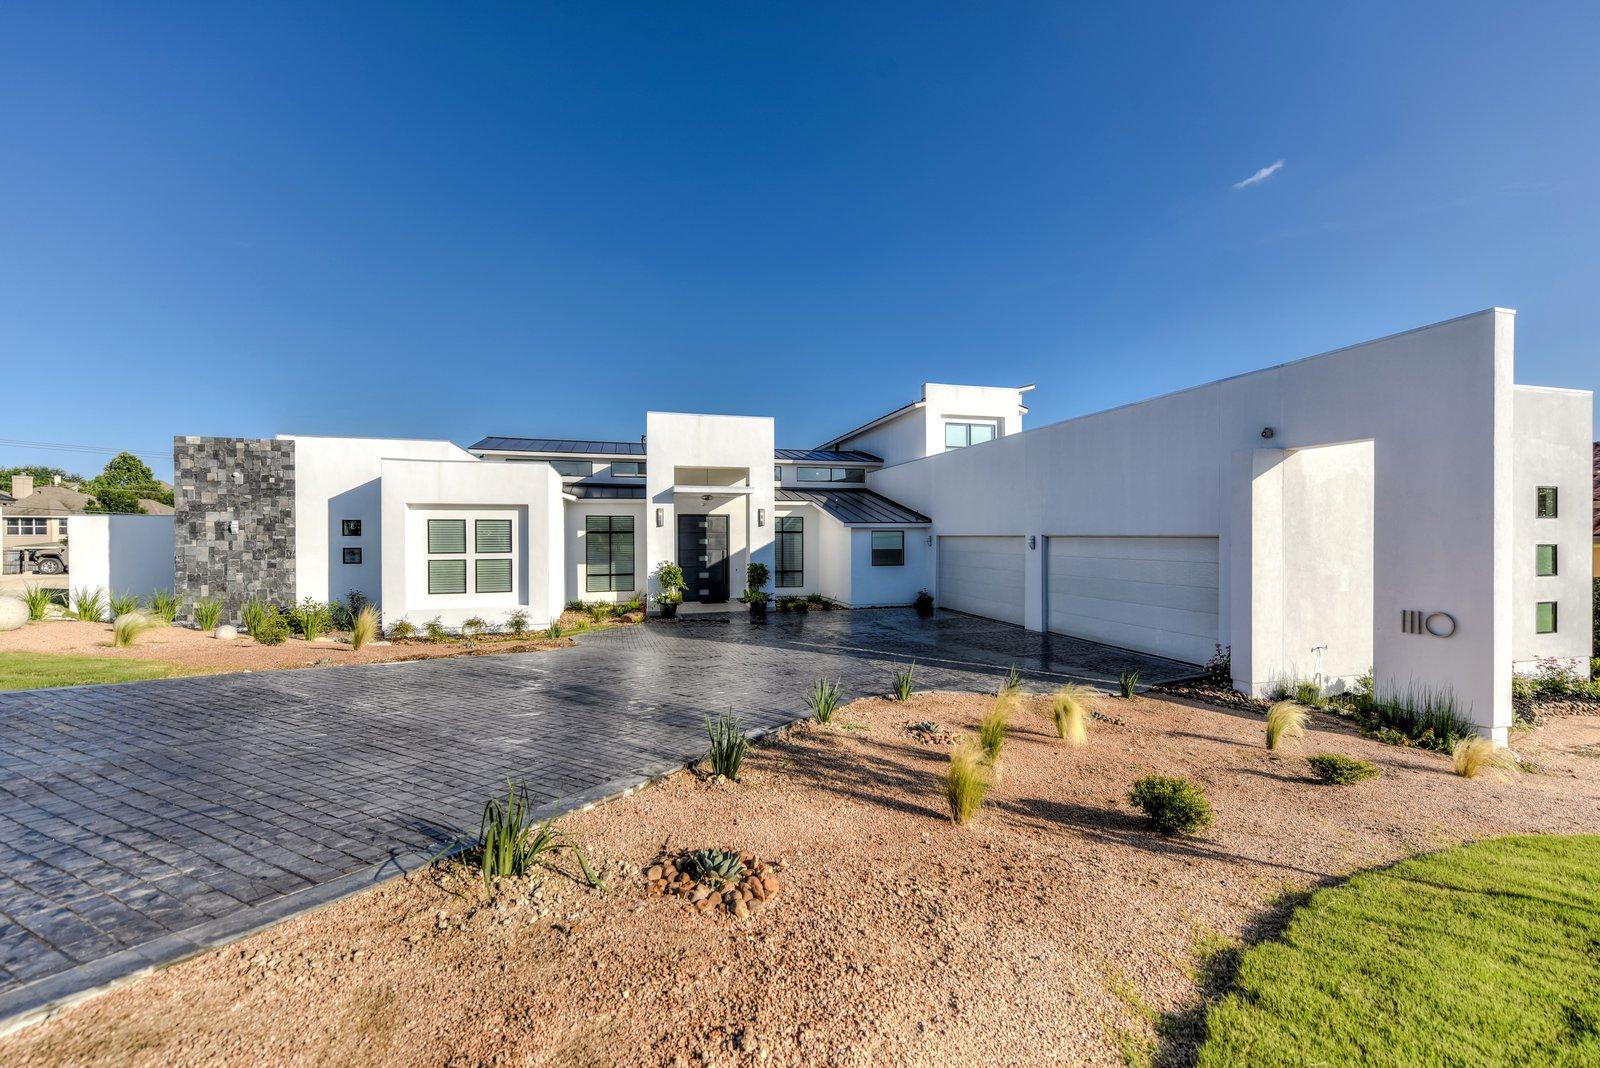 Orvananos House Modern Home In San Antonio Texas By Oscar